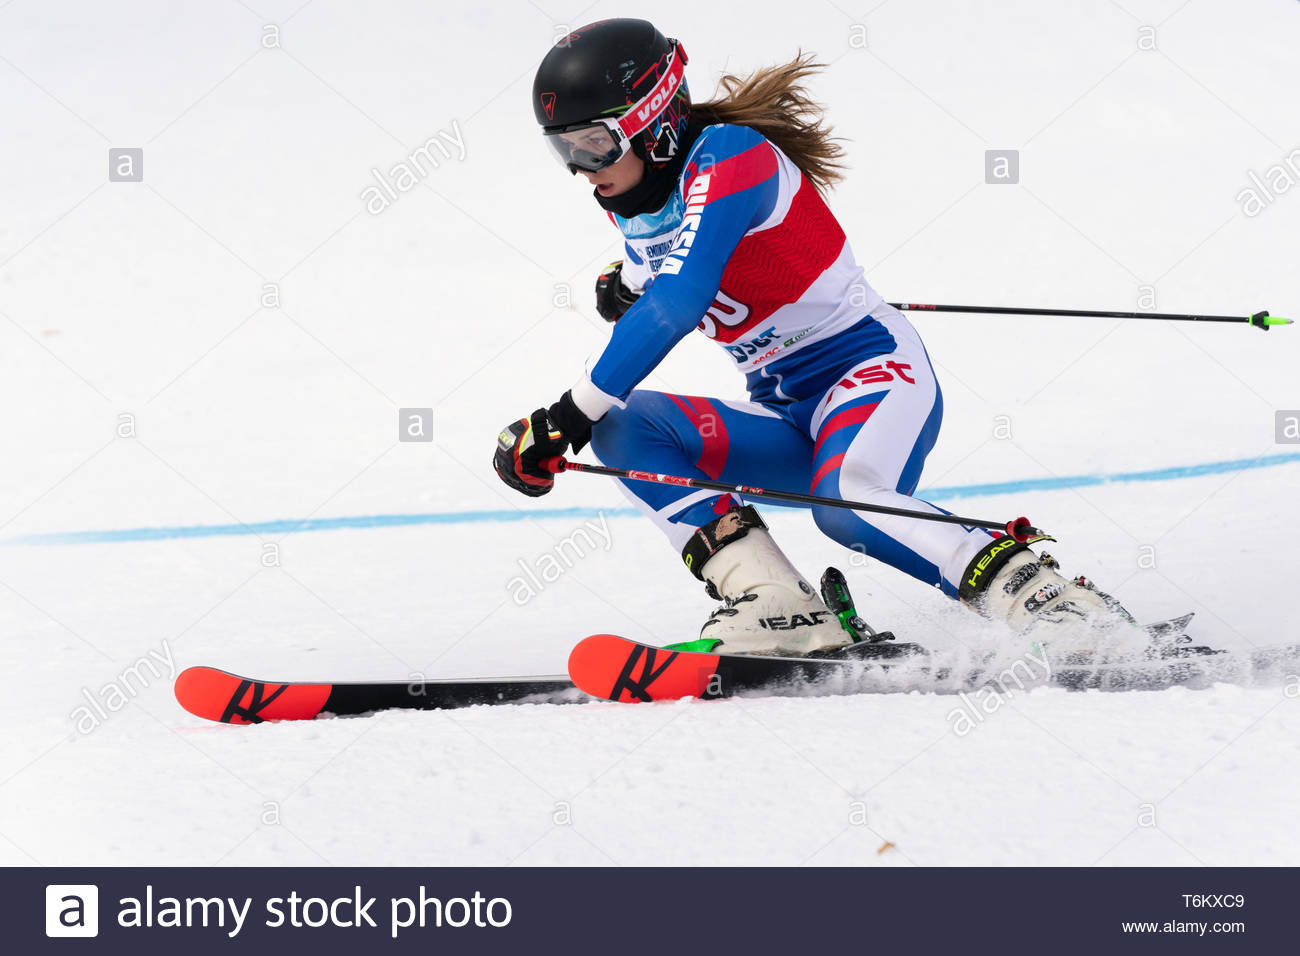 KAMCHATKA, RUSSIA - APR 2, 2019: Russian Women's Alpine Skiing Cup, International Ski Federation Championship, giant slalom. Mountain skier Ulyana Len - Stock Image